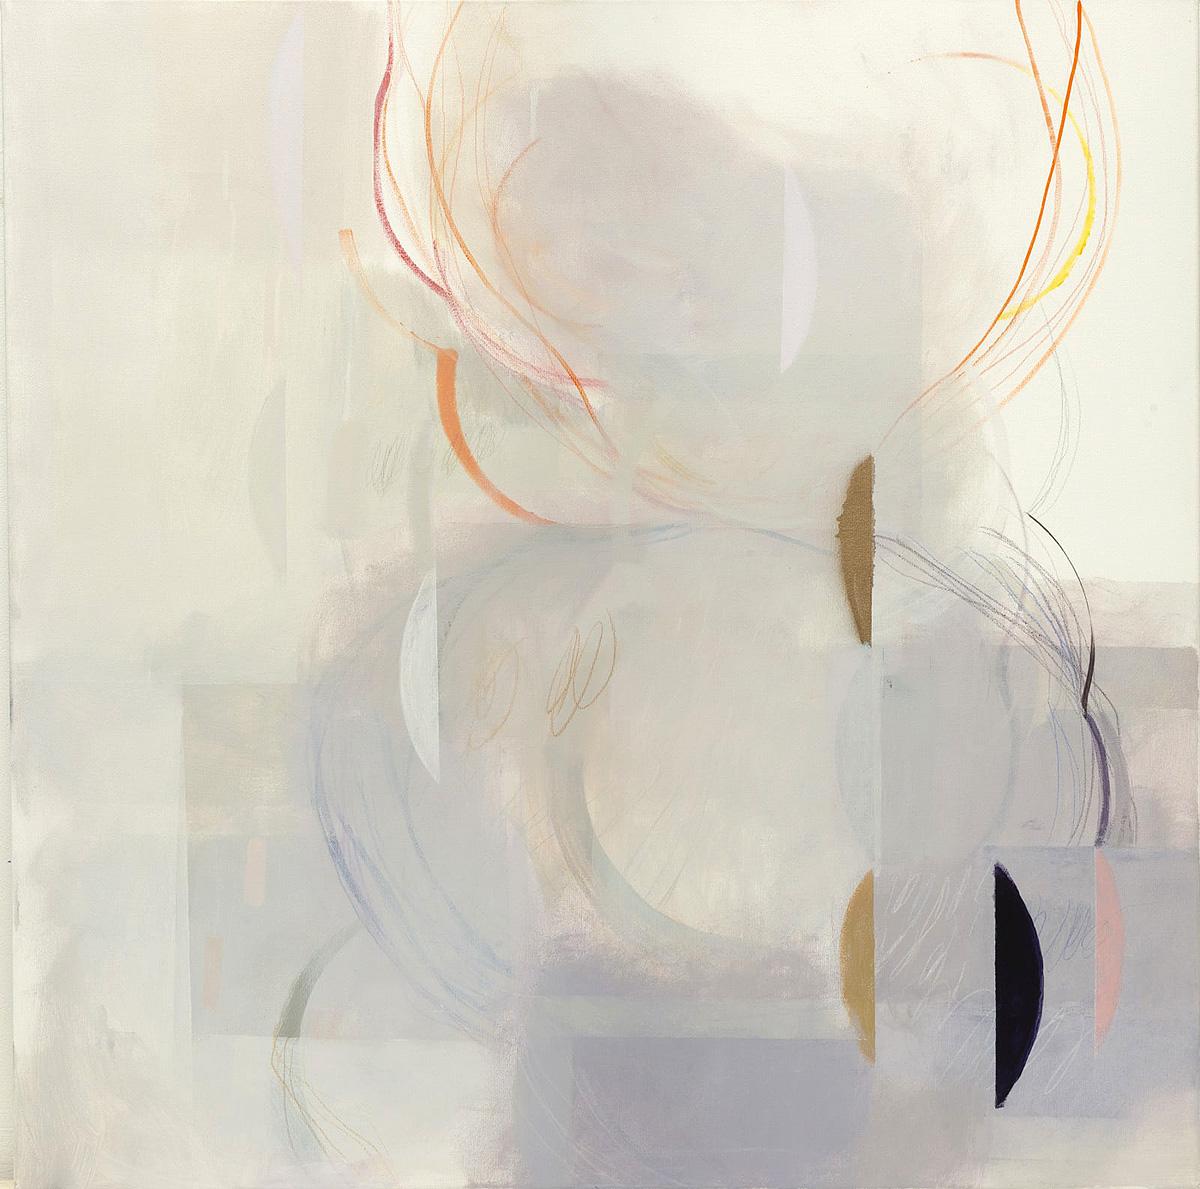 Ele Pack, 'Open Heart II', mixed media on canvas